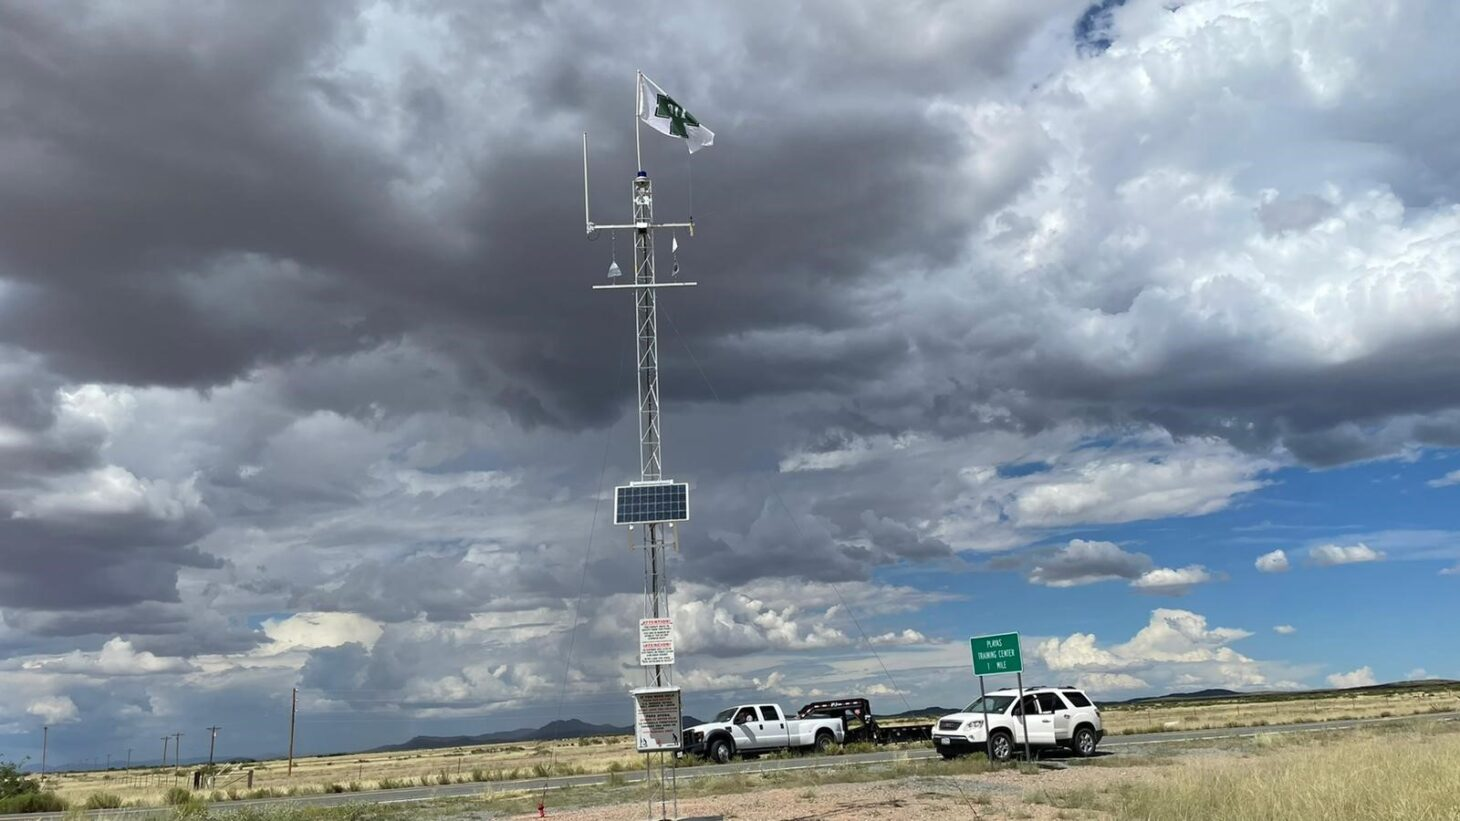 Photo courtesy U.S. Border Patrol